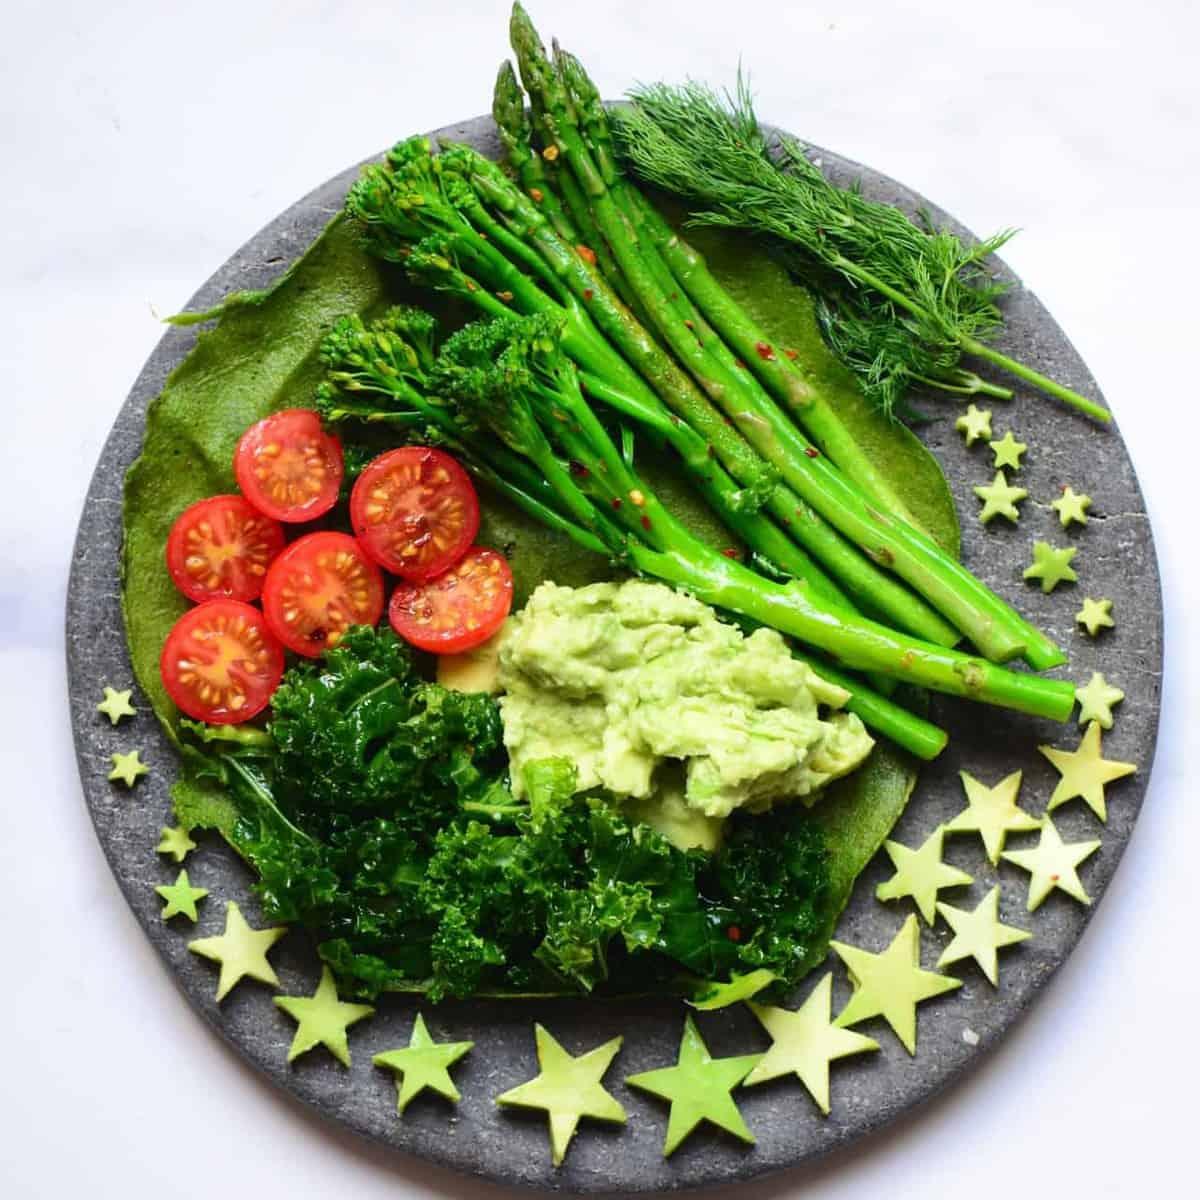 Protein green pancake topped with veggies